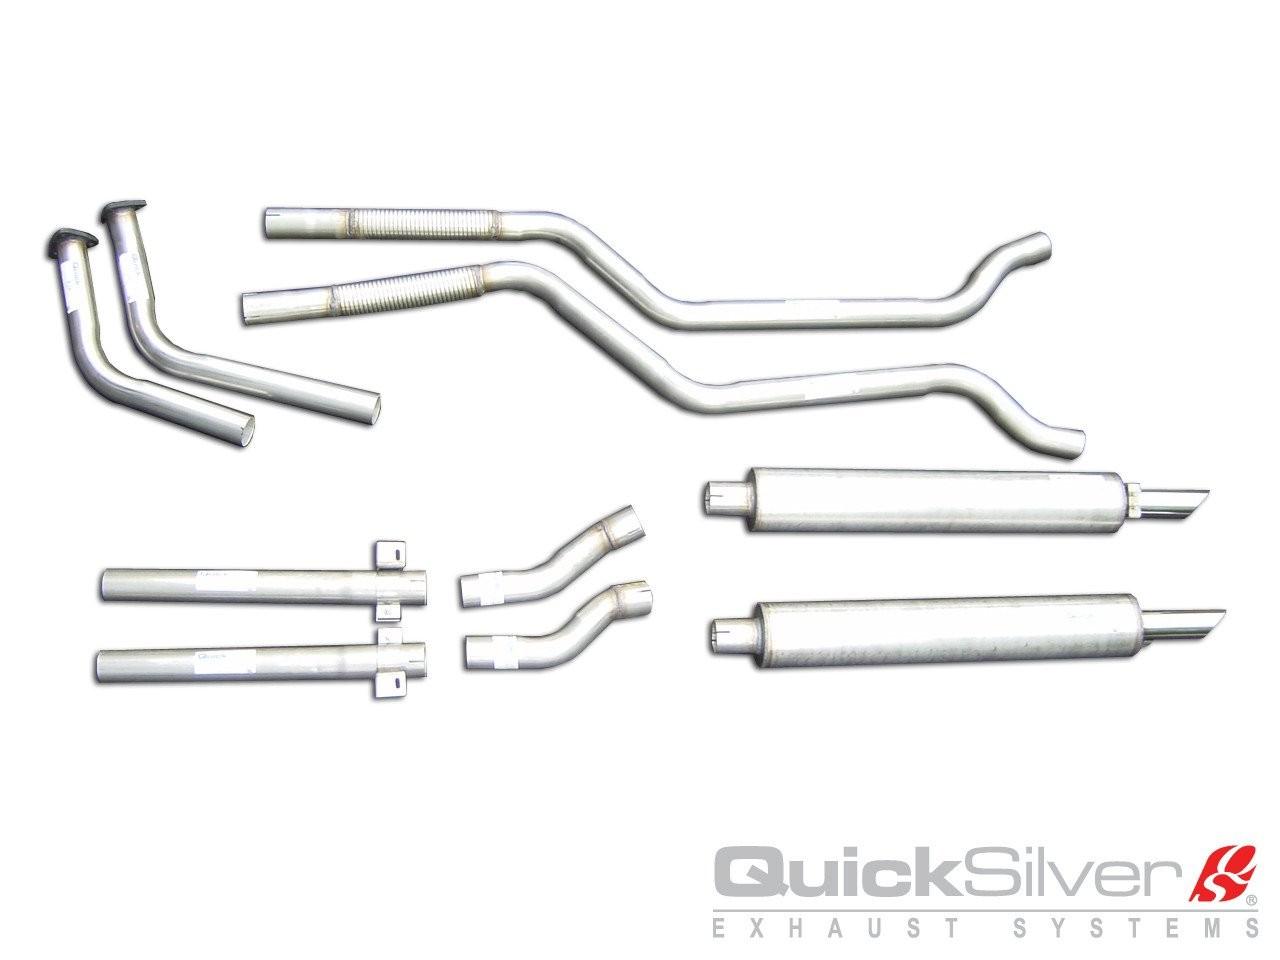 QuickSilver Exhausts Heritage | Aston Martin DBS - 6 Vantage, 1967-72, AS008 (Výfukový systém – nerezová ocel)